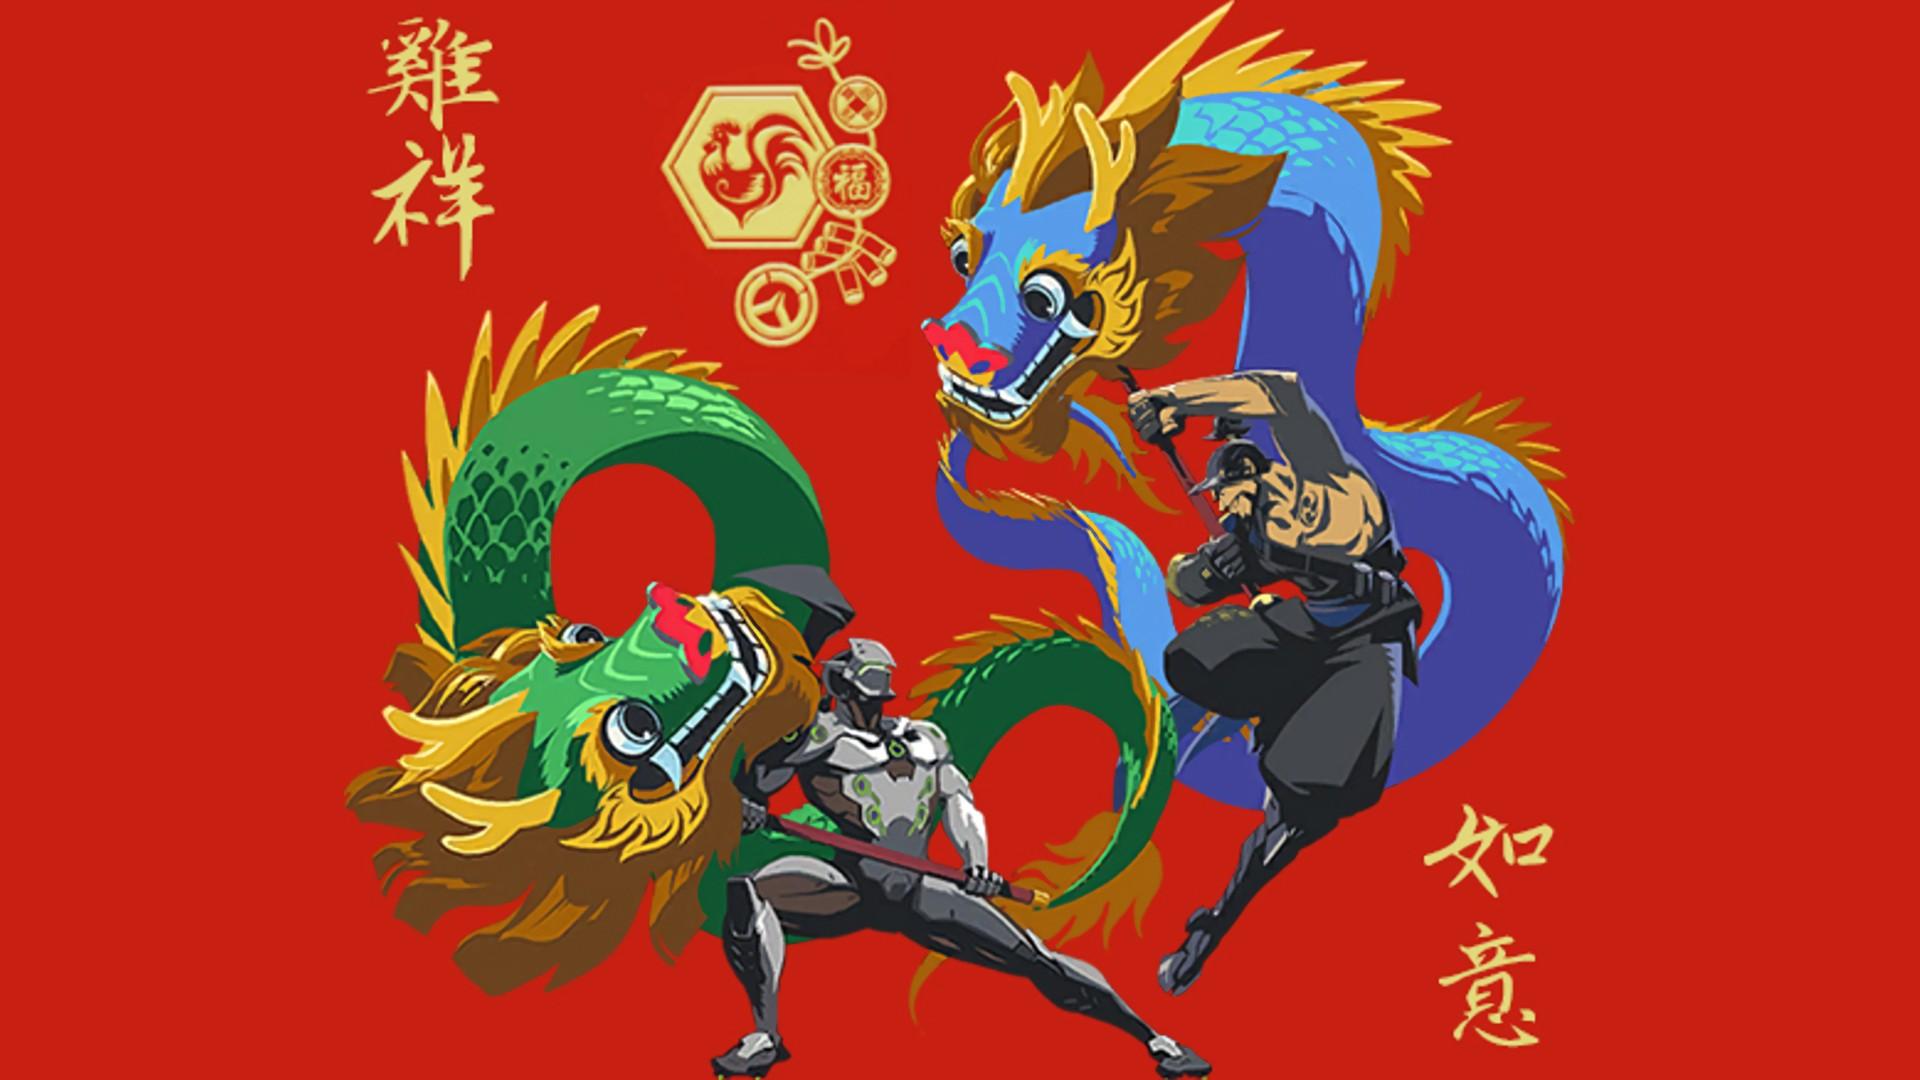 Overwatch Hanzo Wallpaper Iphone Genji Overwatch Wallpaper 183 ① Download Free Beautiful Full